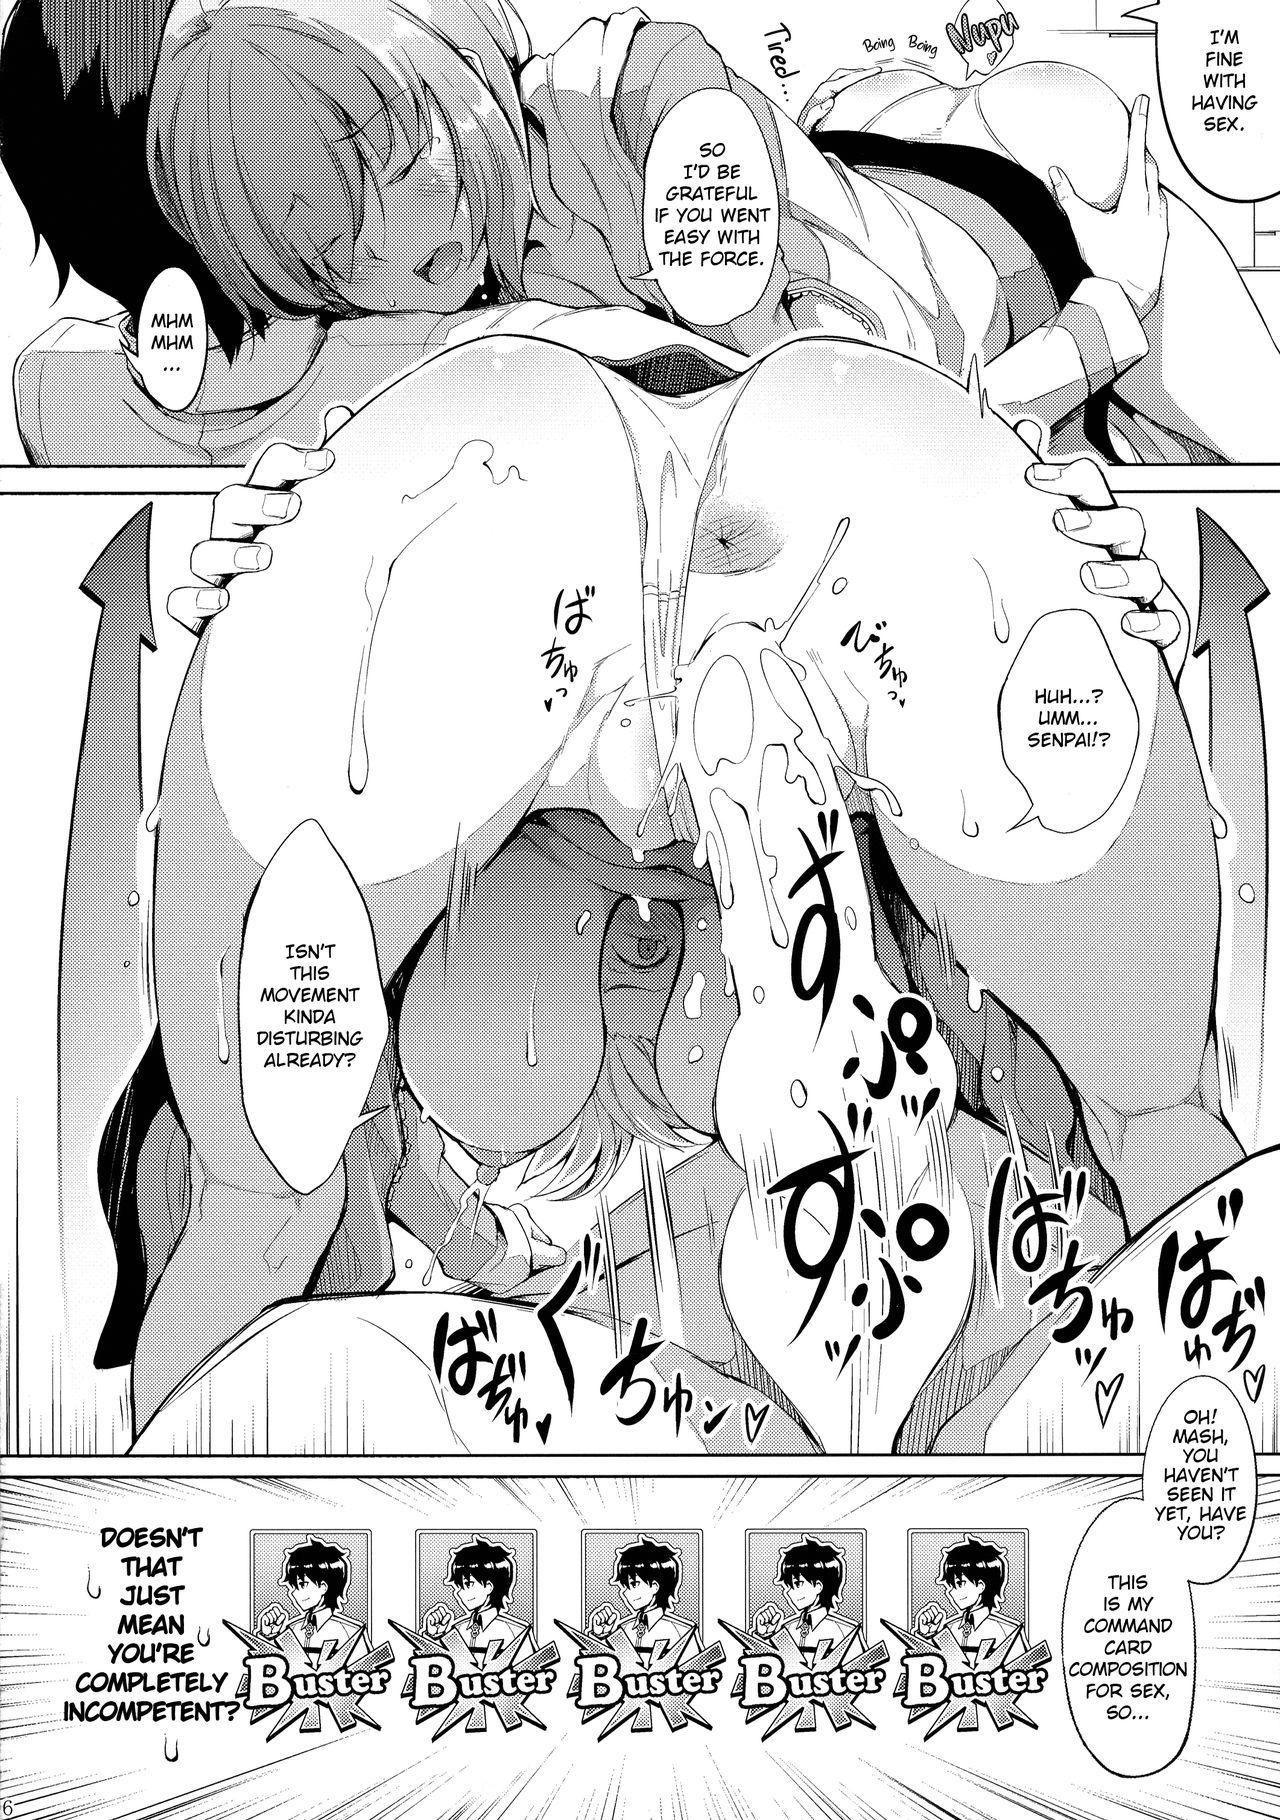 Oppai wa Daini Skill no Aji ga Suru | Boobs Taste Like the Second Skill 17